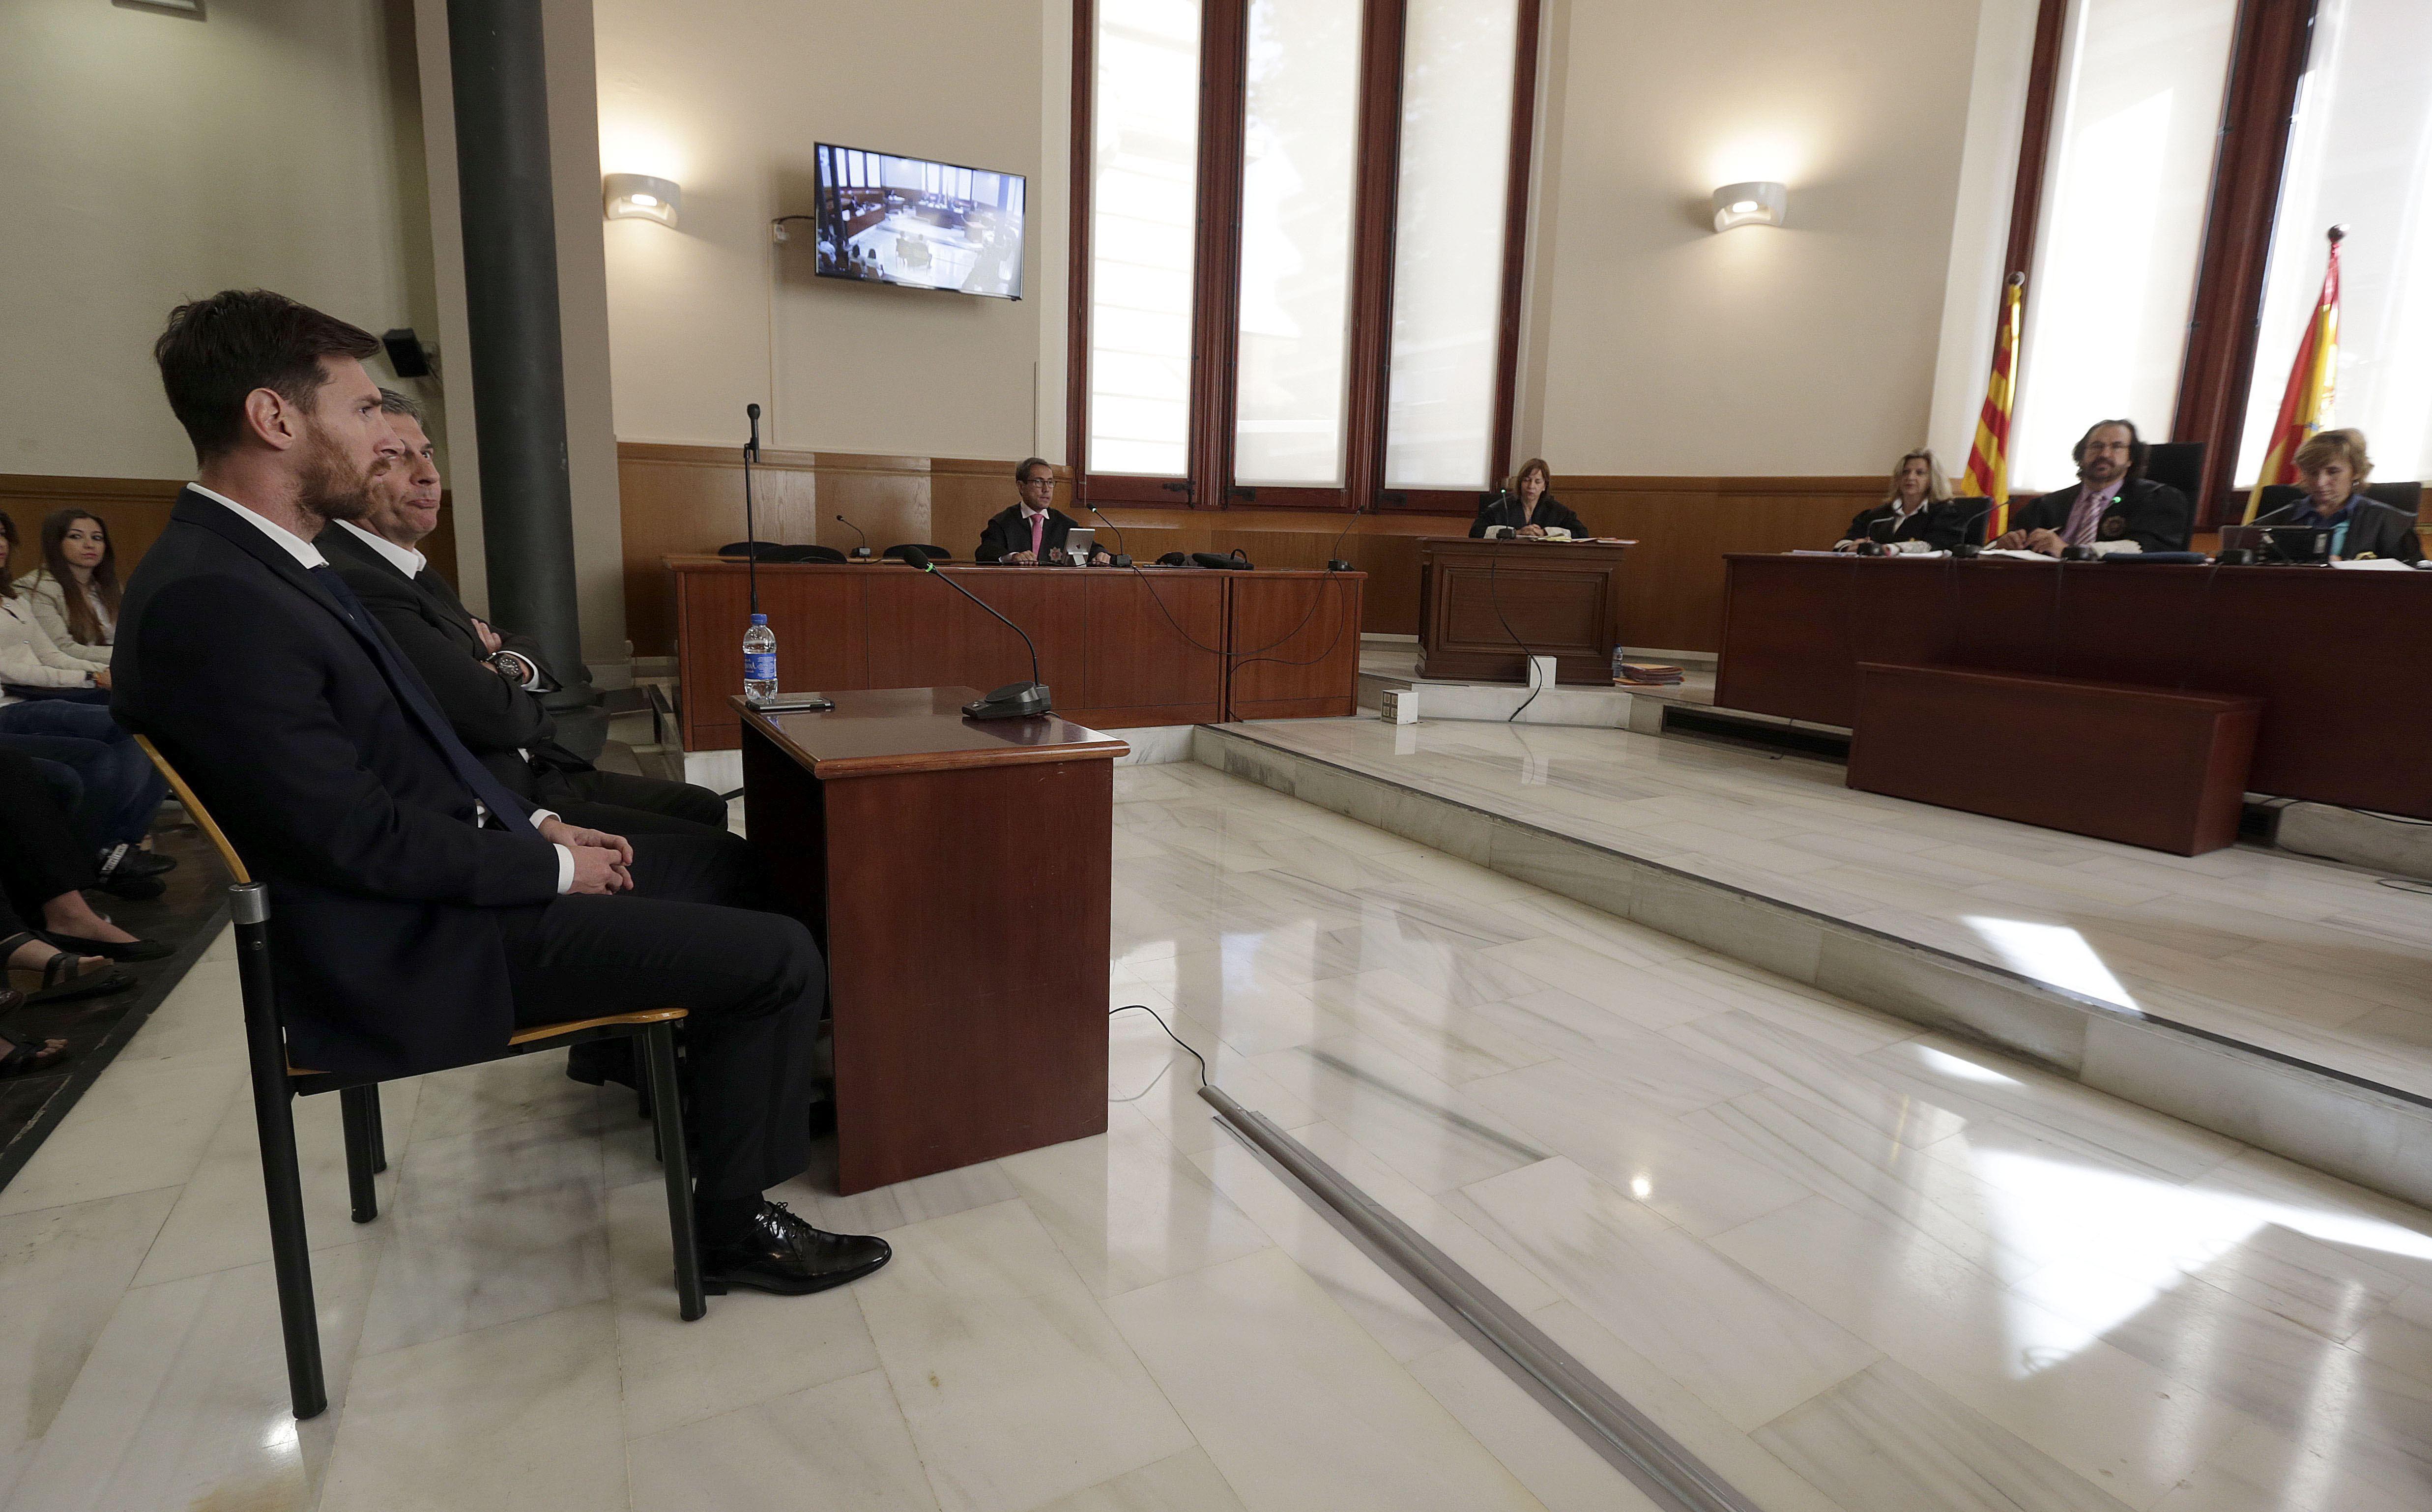 judici Messi / EFE